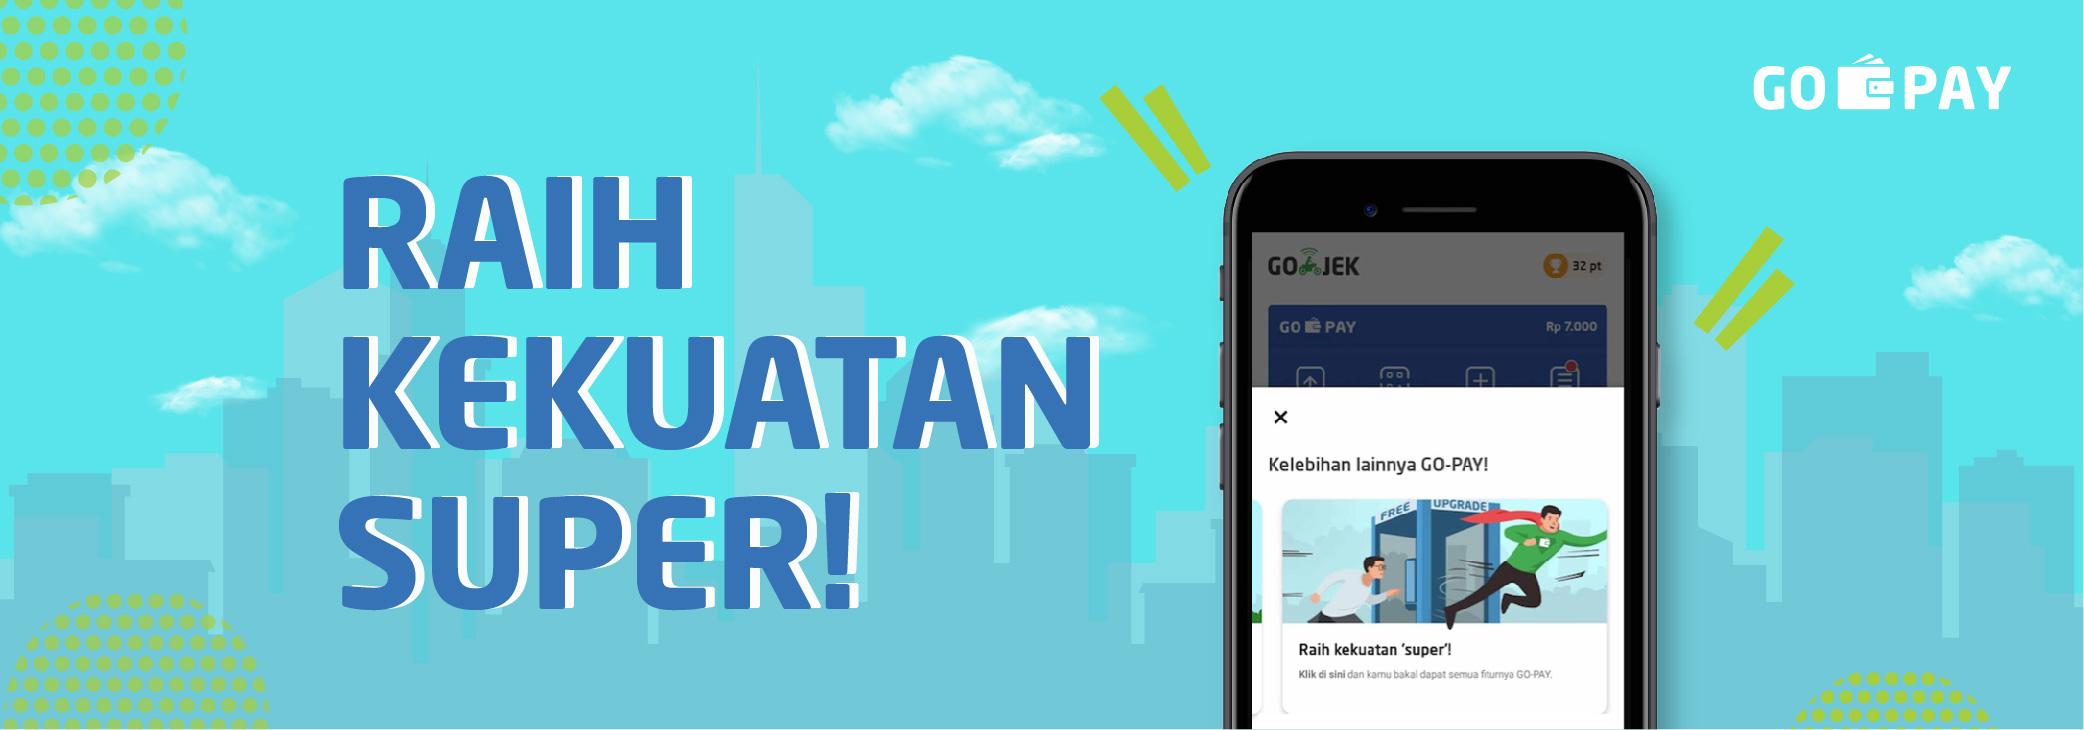 Cara Mudah Upgrade Akun Go Pay Go Pay Go Jek Indonesia